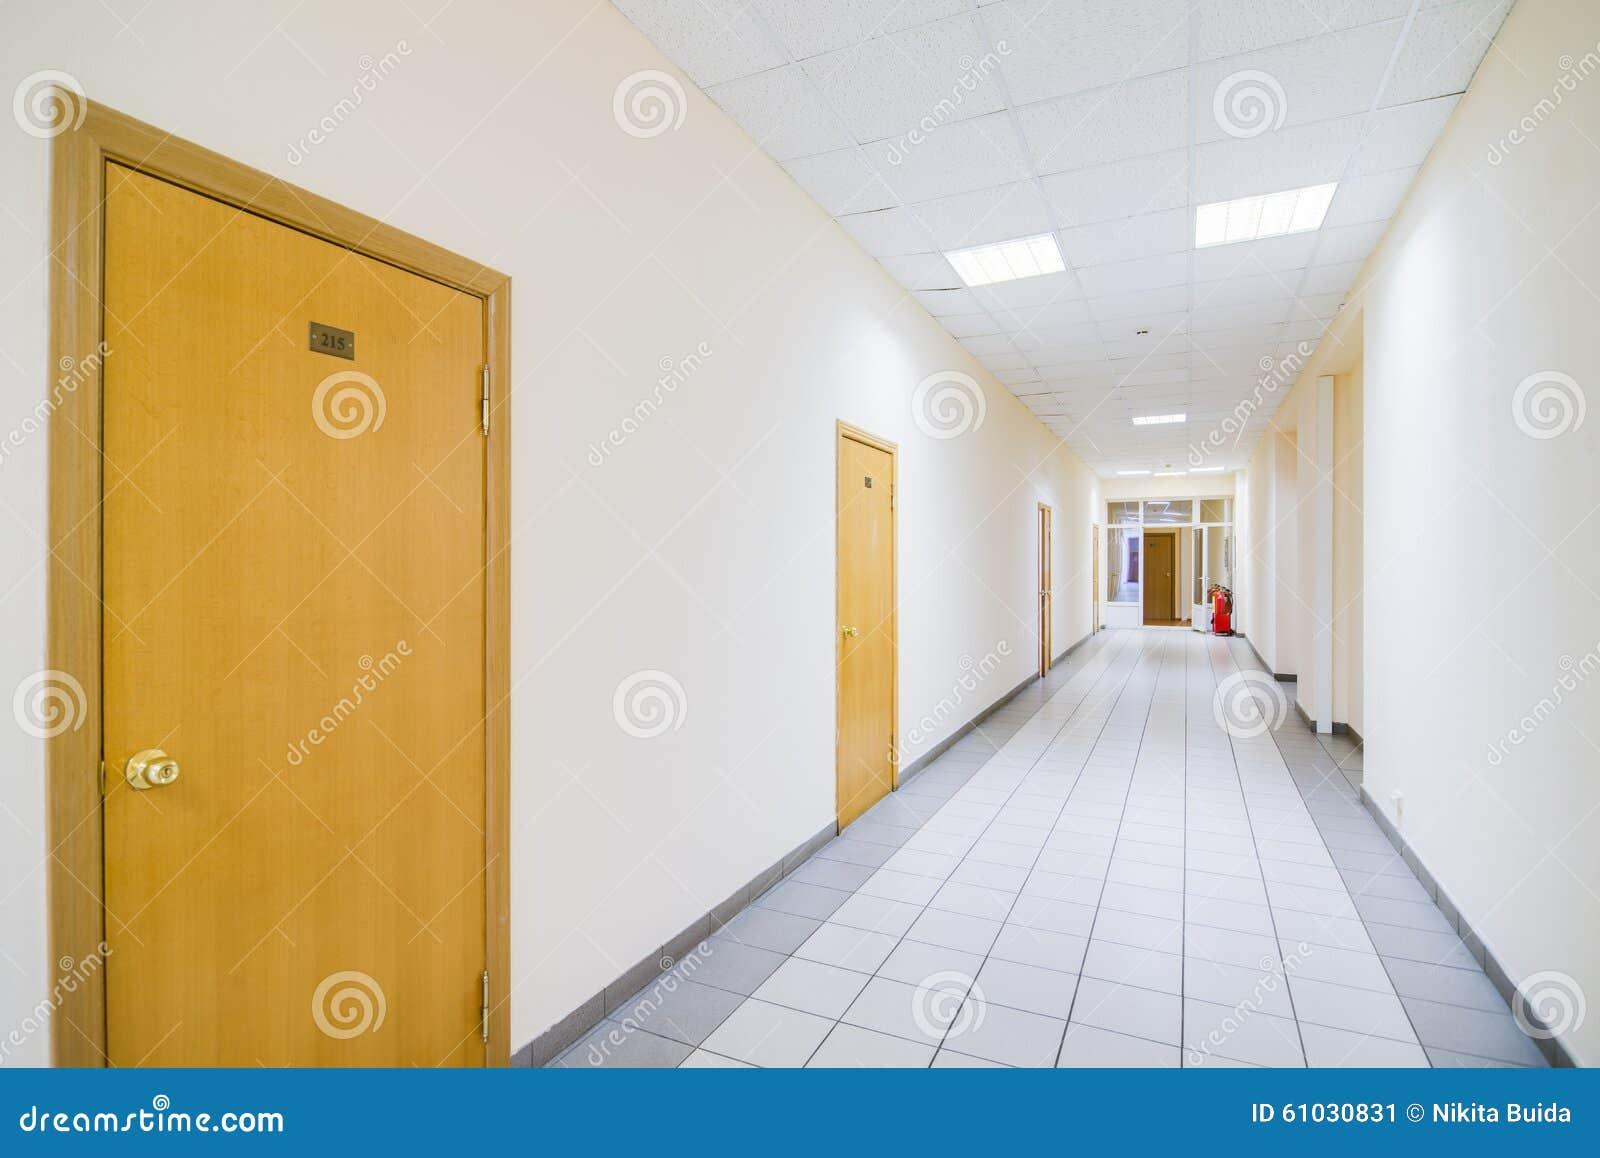 Fondo del interior de la oficina foto editorial imagen for Interior oficina